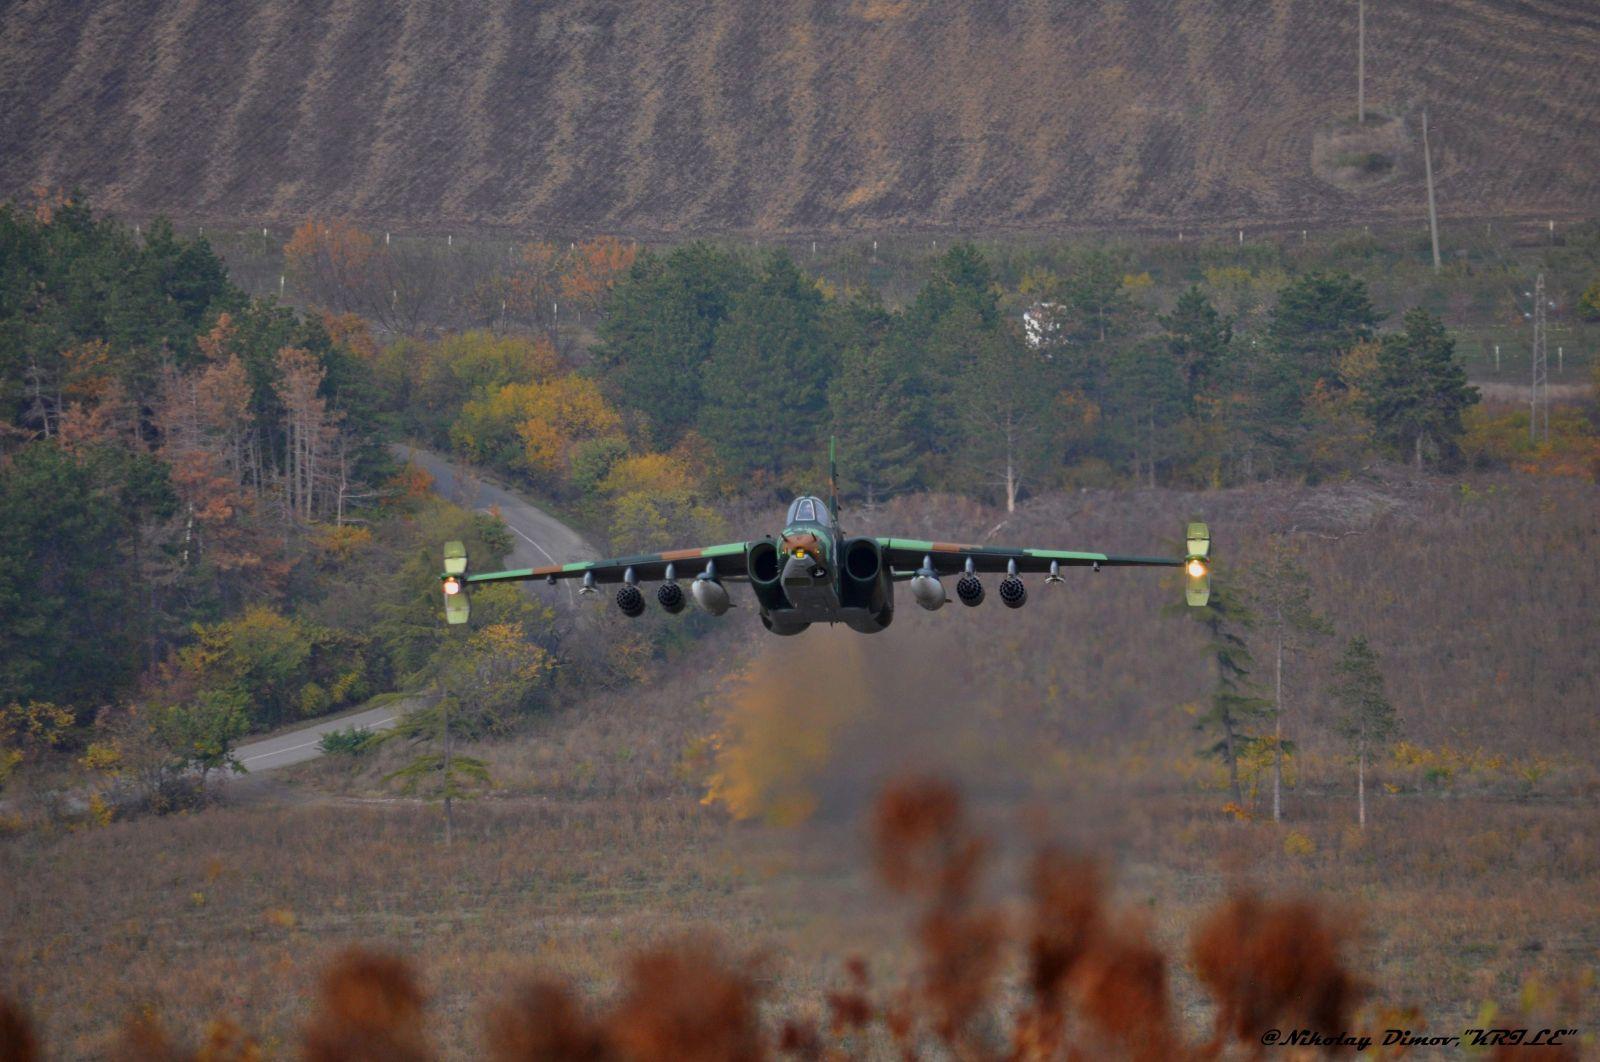 Авиобаза Безмер активно усвоява модернизираните щурмовици Су-25